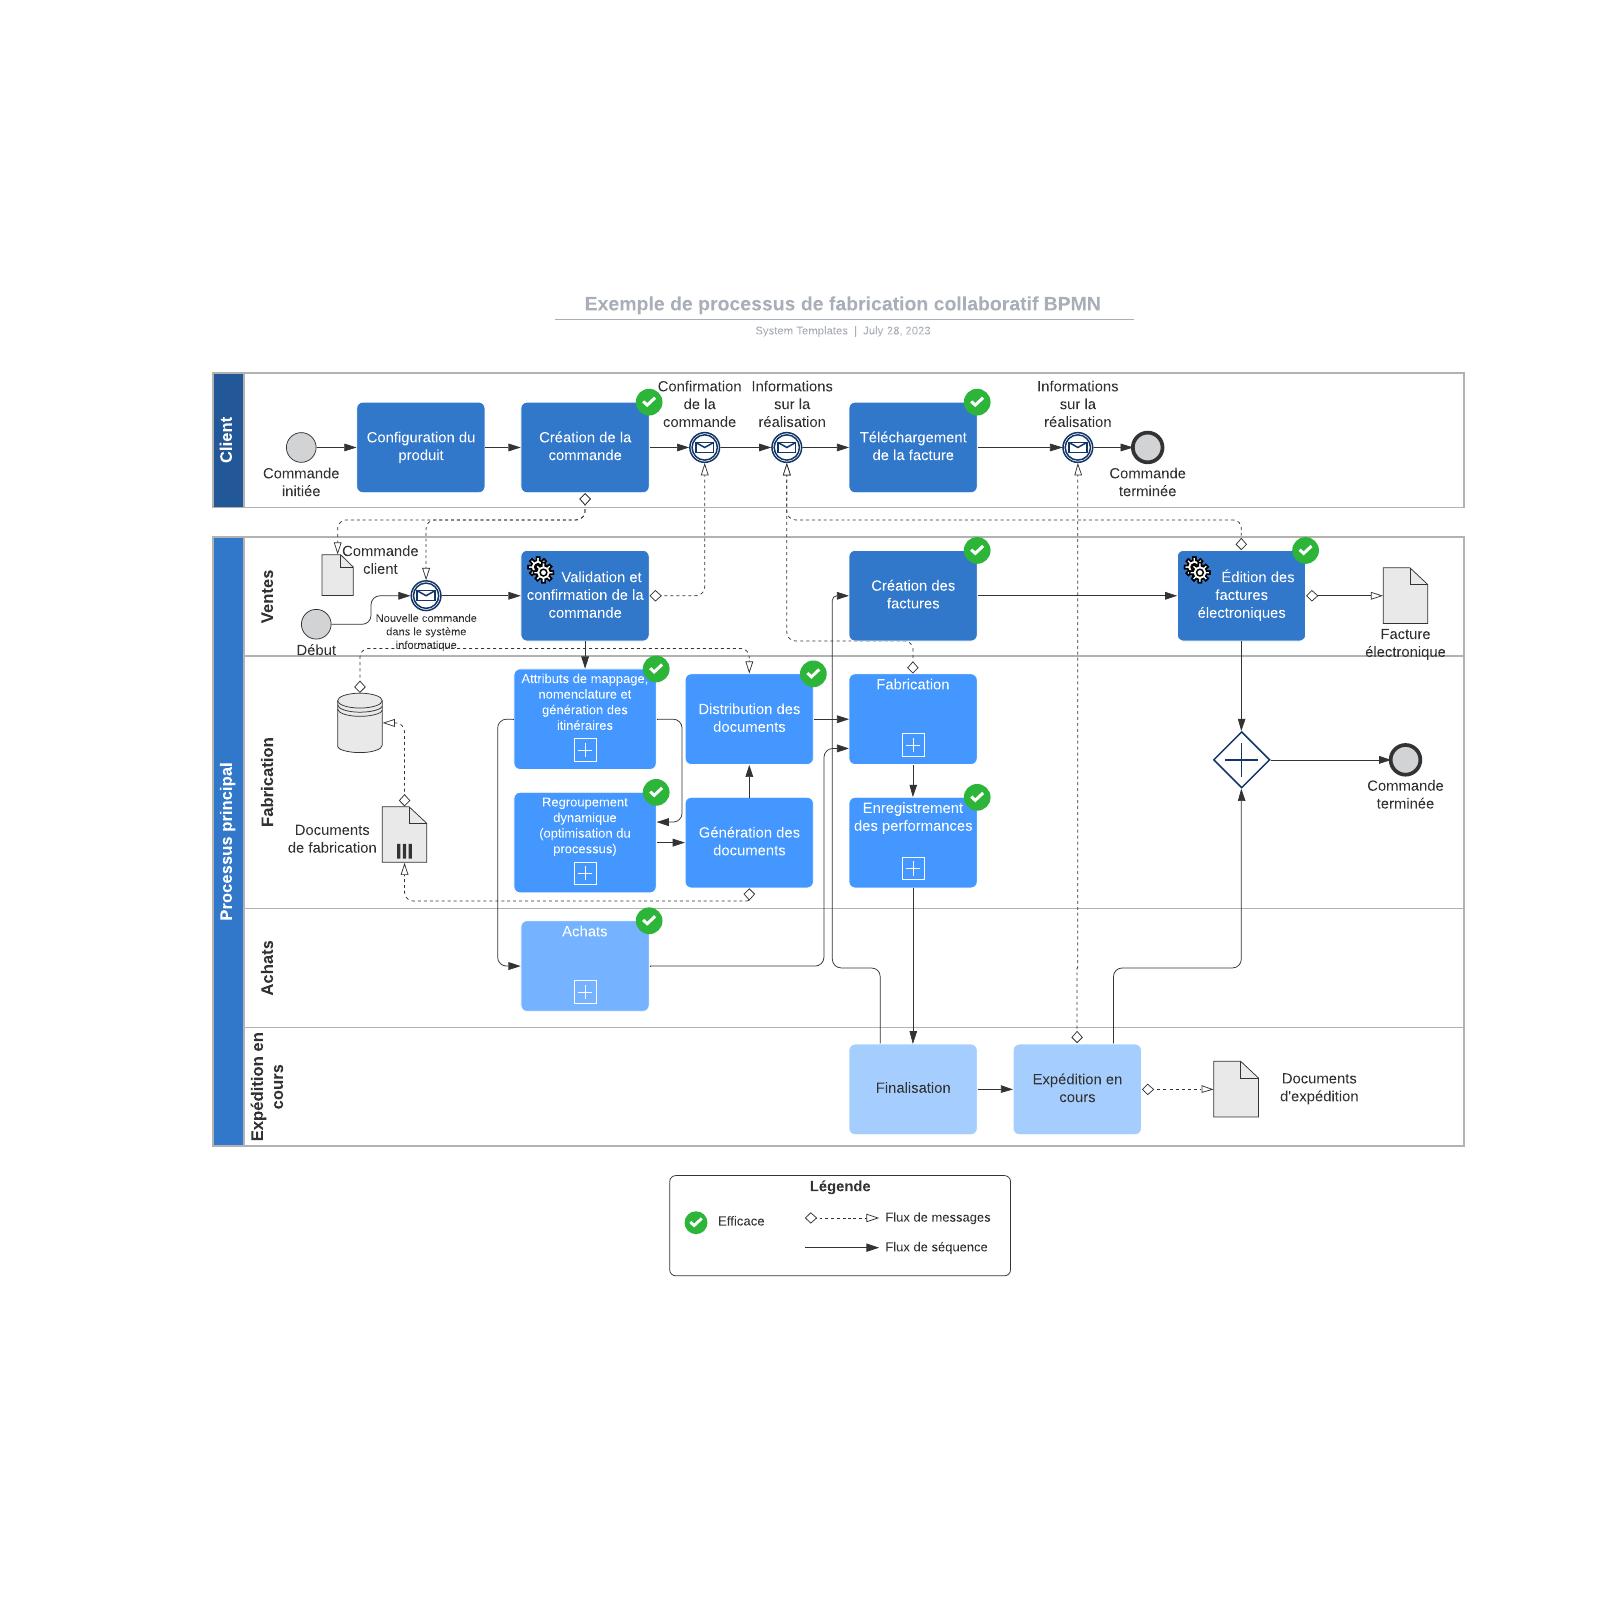 exemple de processus de fabrication collaboratif BPMN